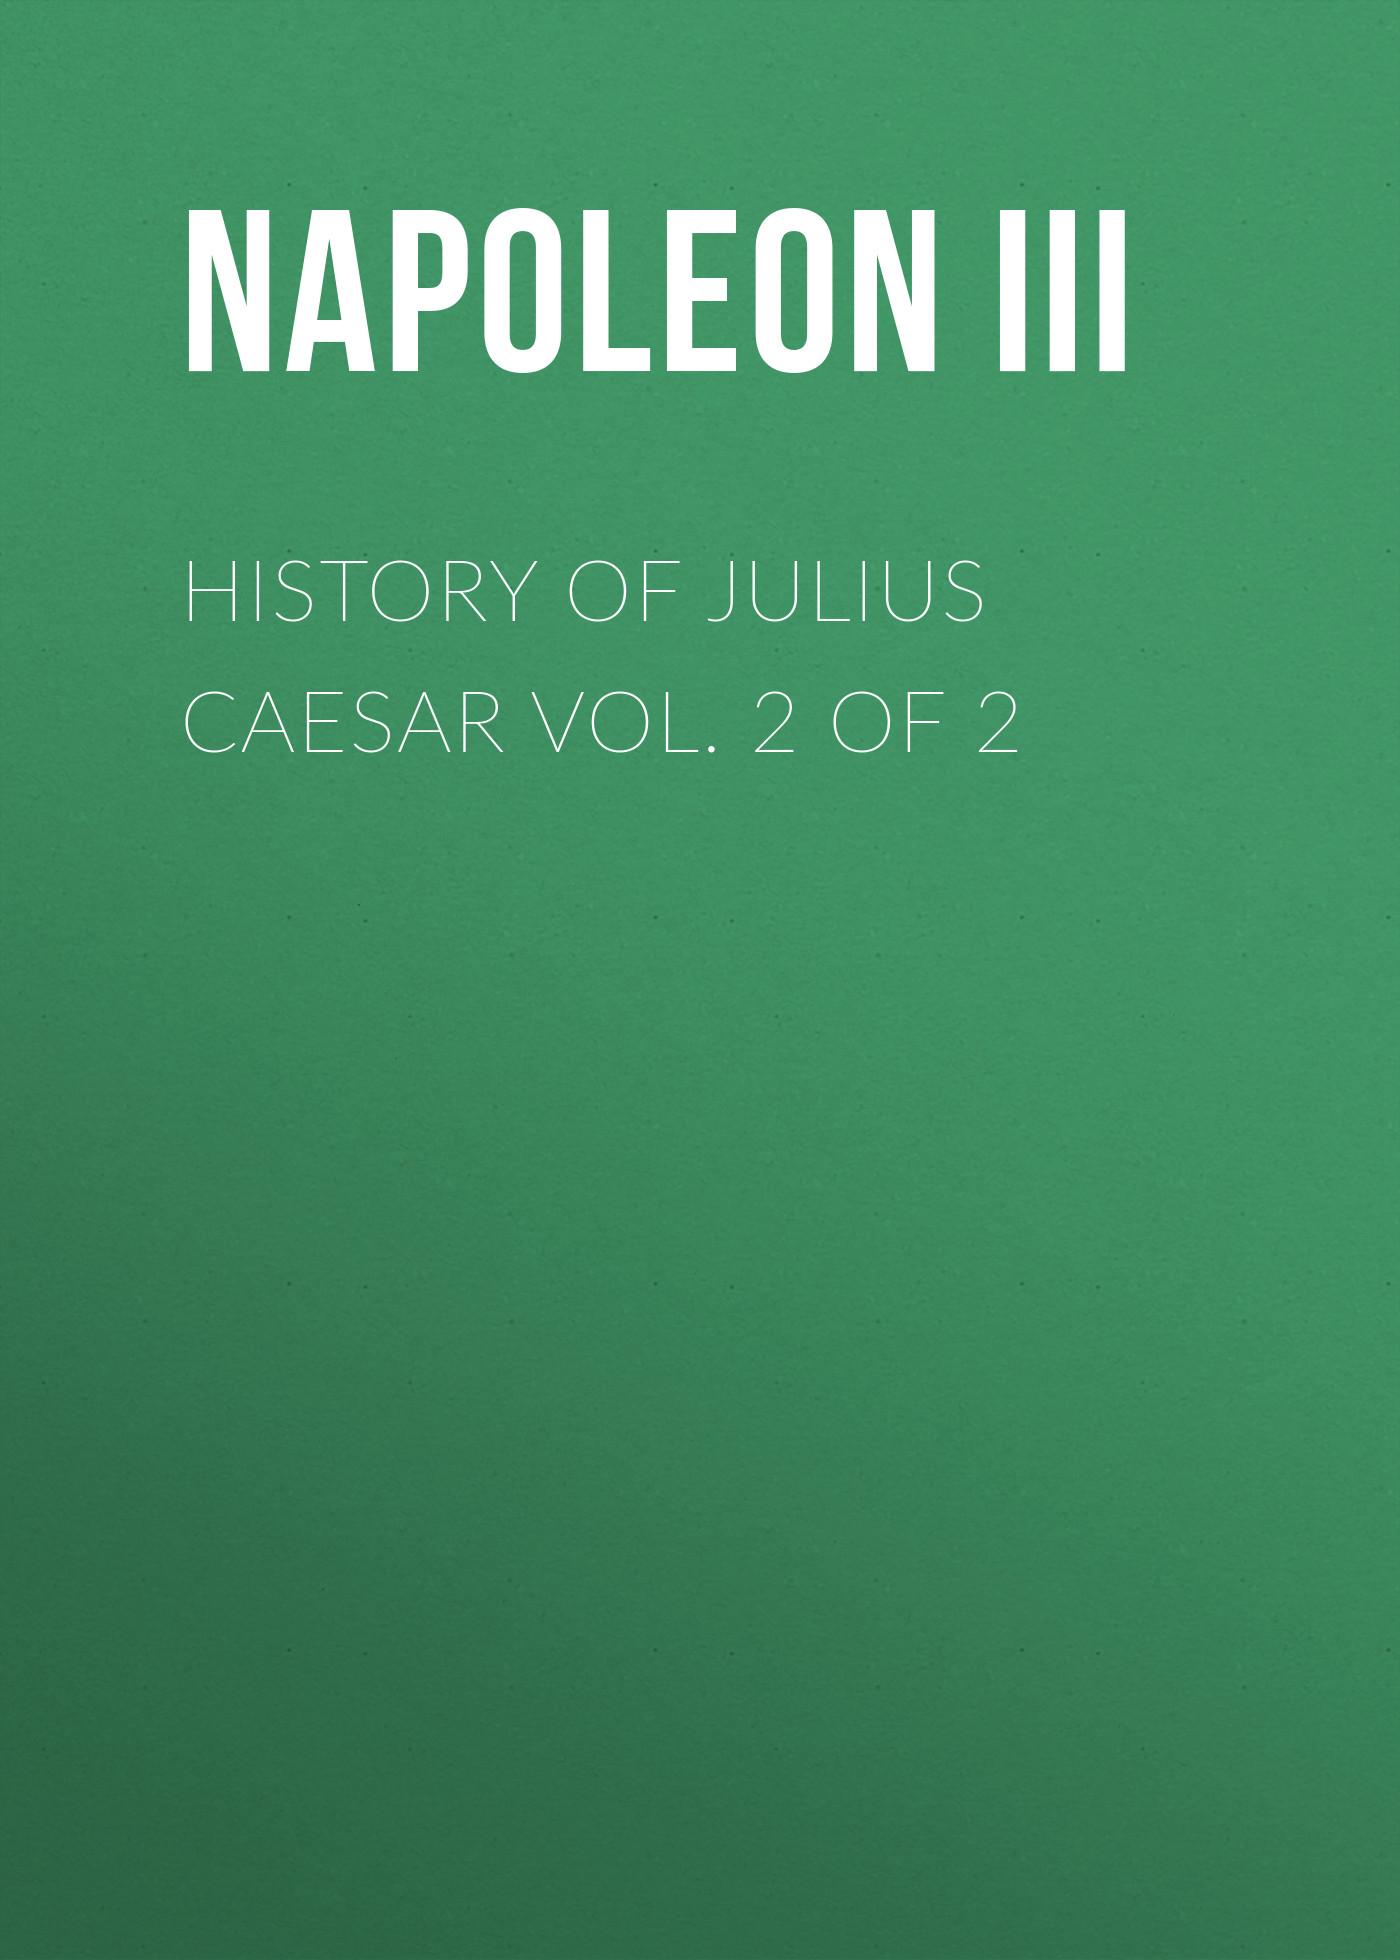 Napoleon III History of Julius Caesar Vol. 2 of 2 mauro palumbo tabula risa vol iii